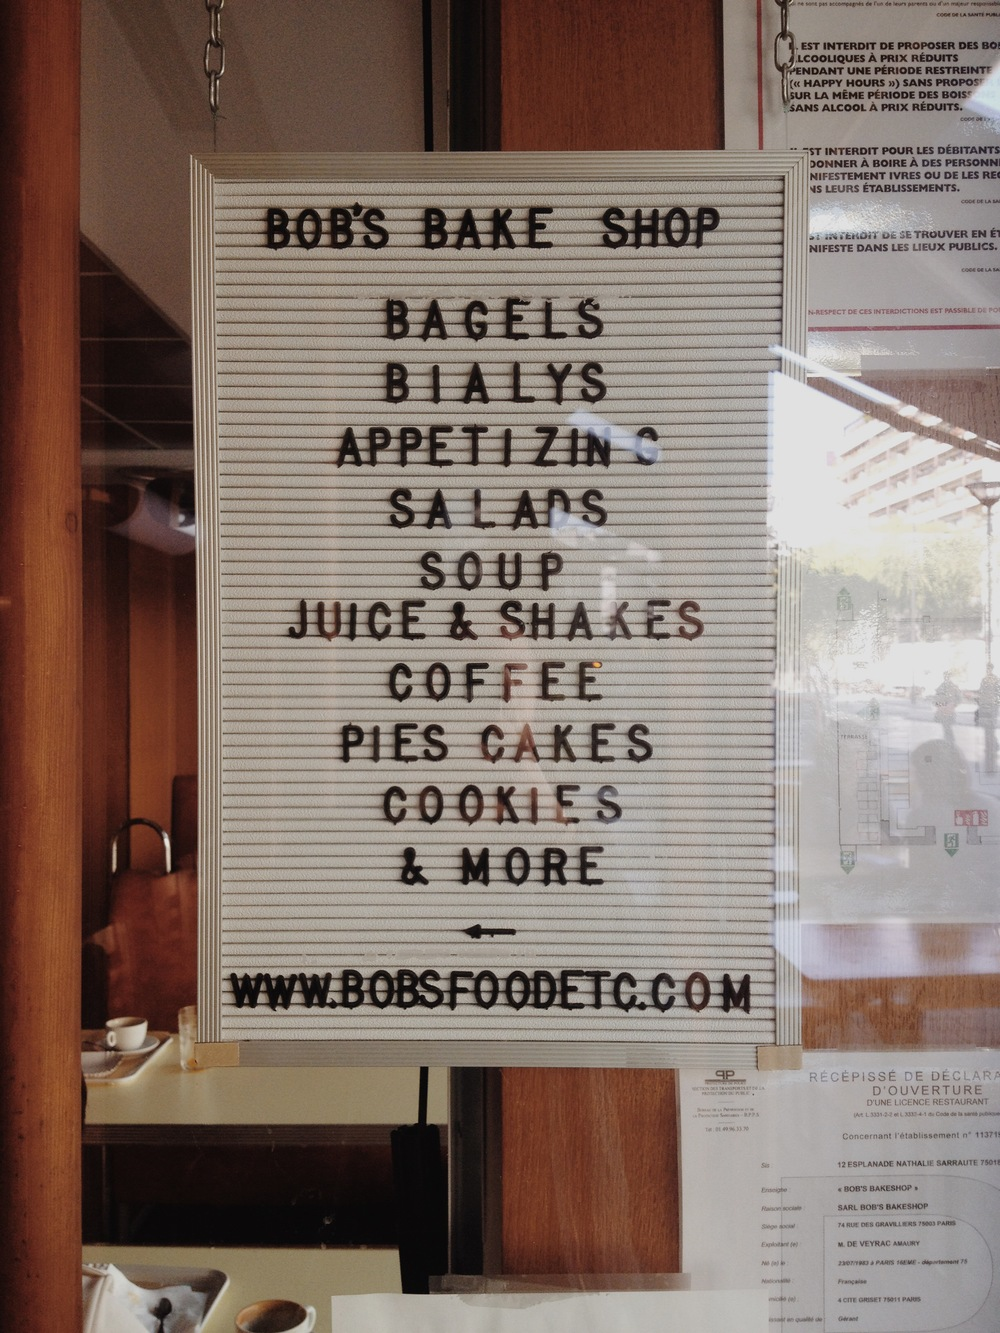 Bob's Bake Shop (75018) - The Flying Flour.com